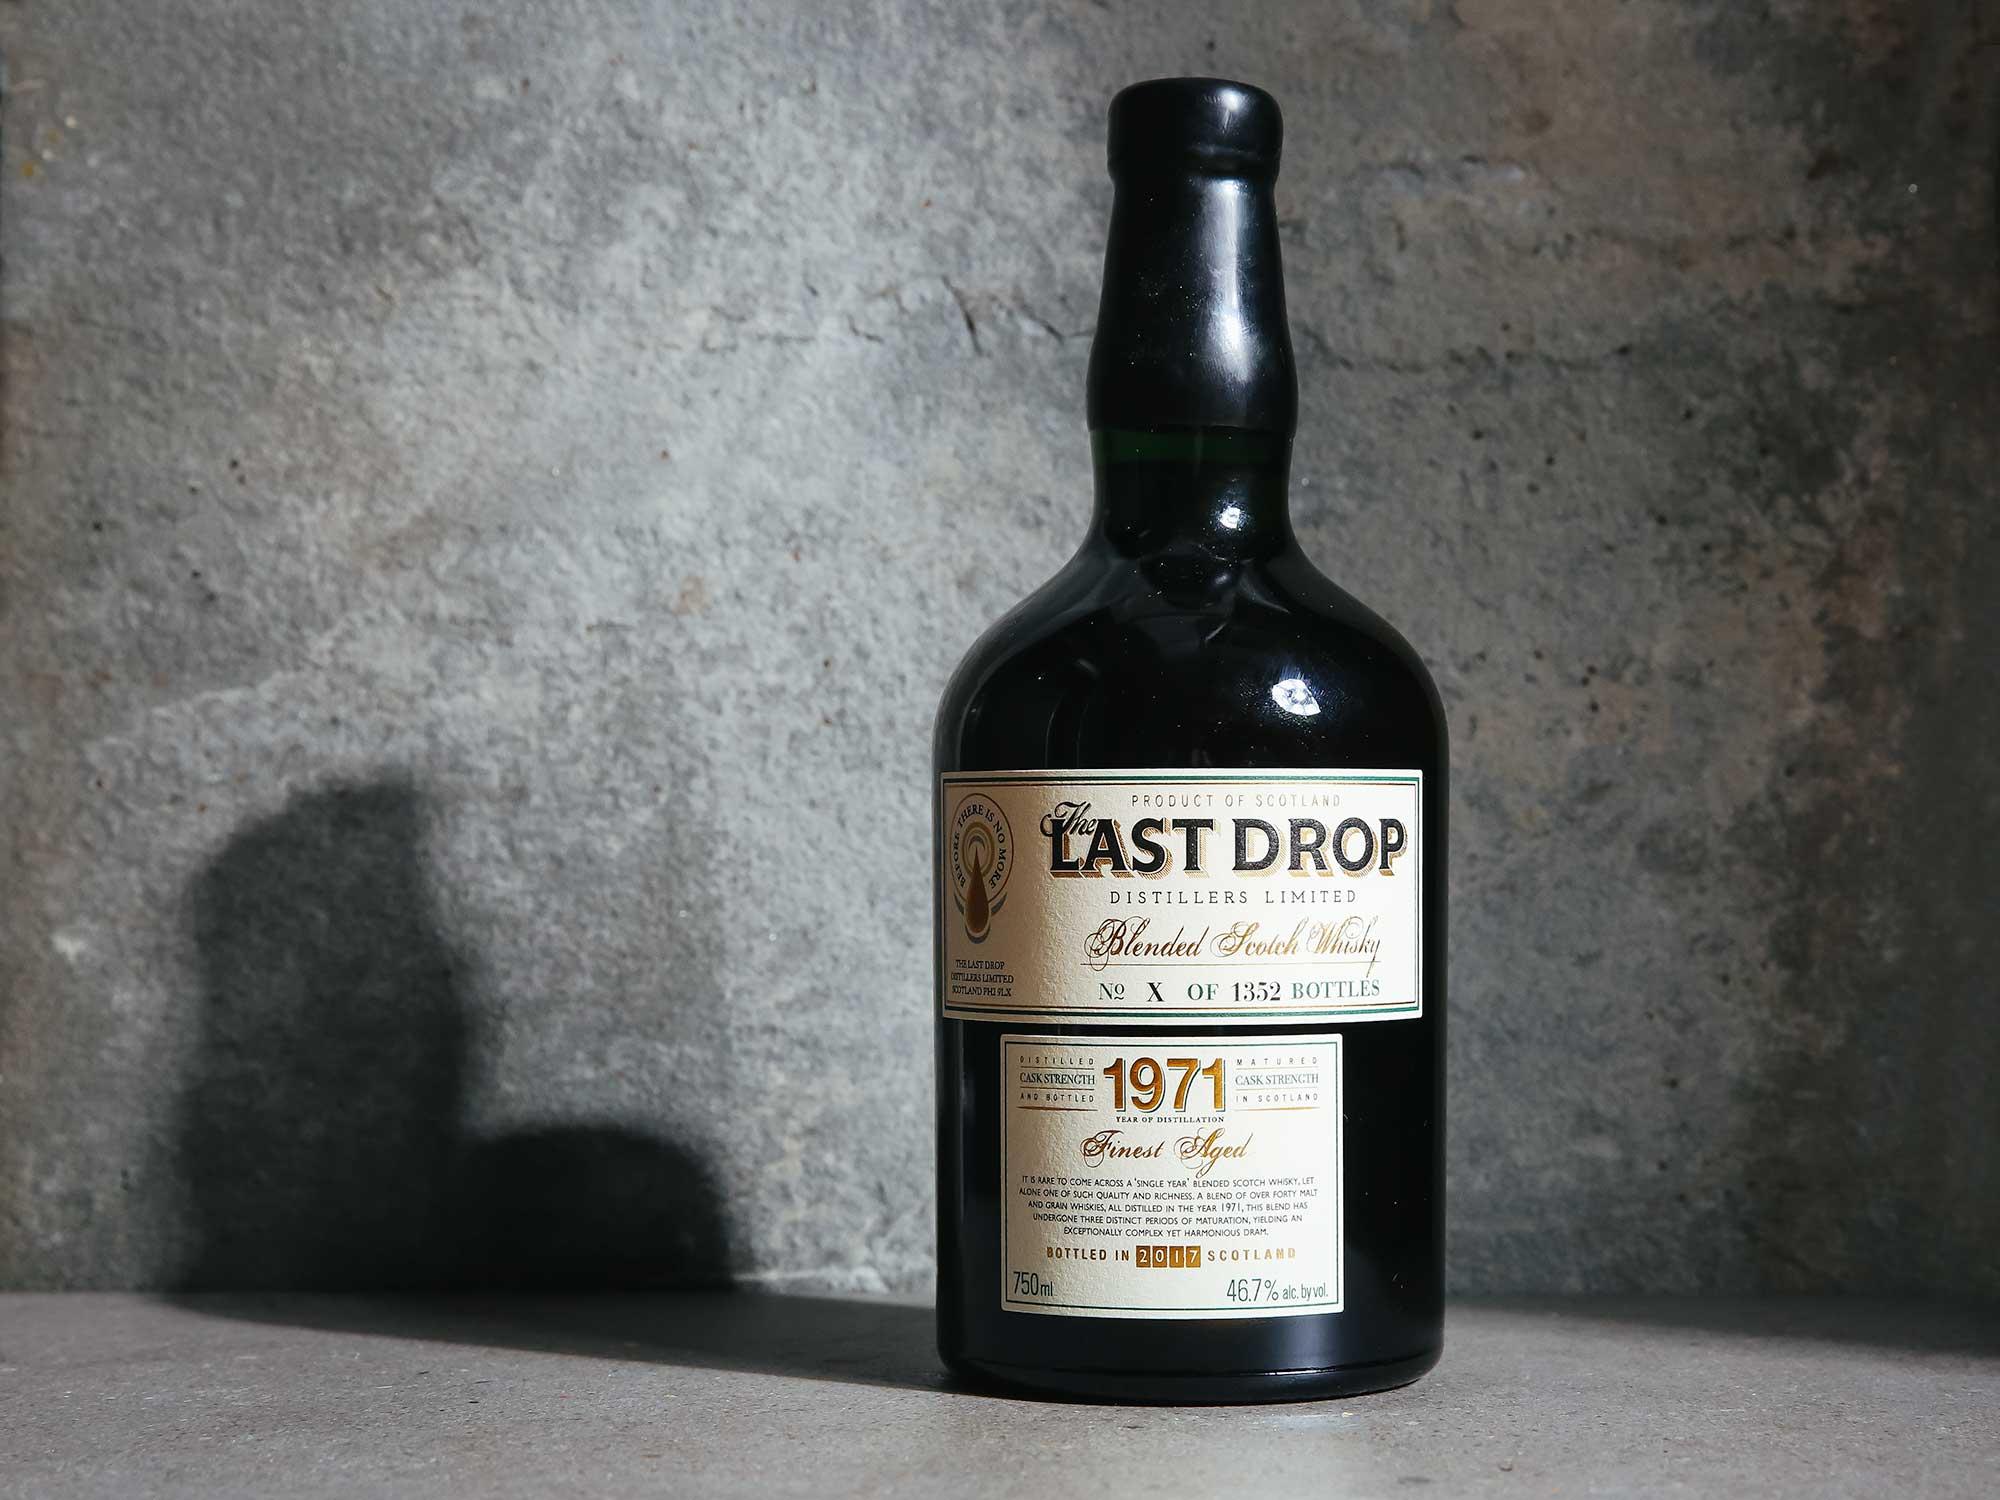 Last Drop Scotch